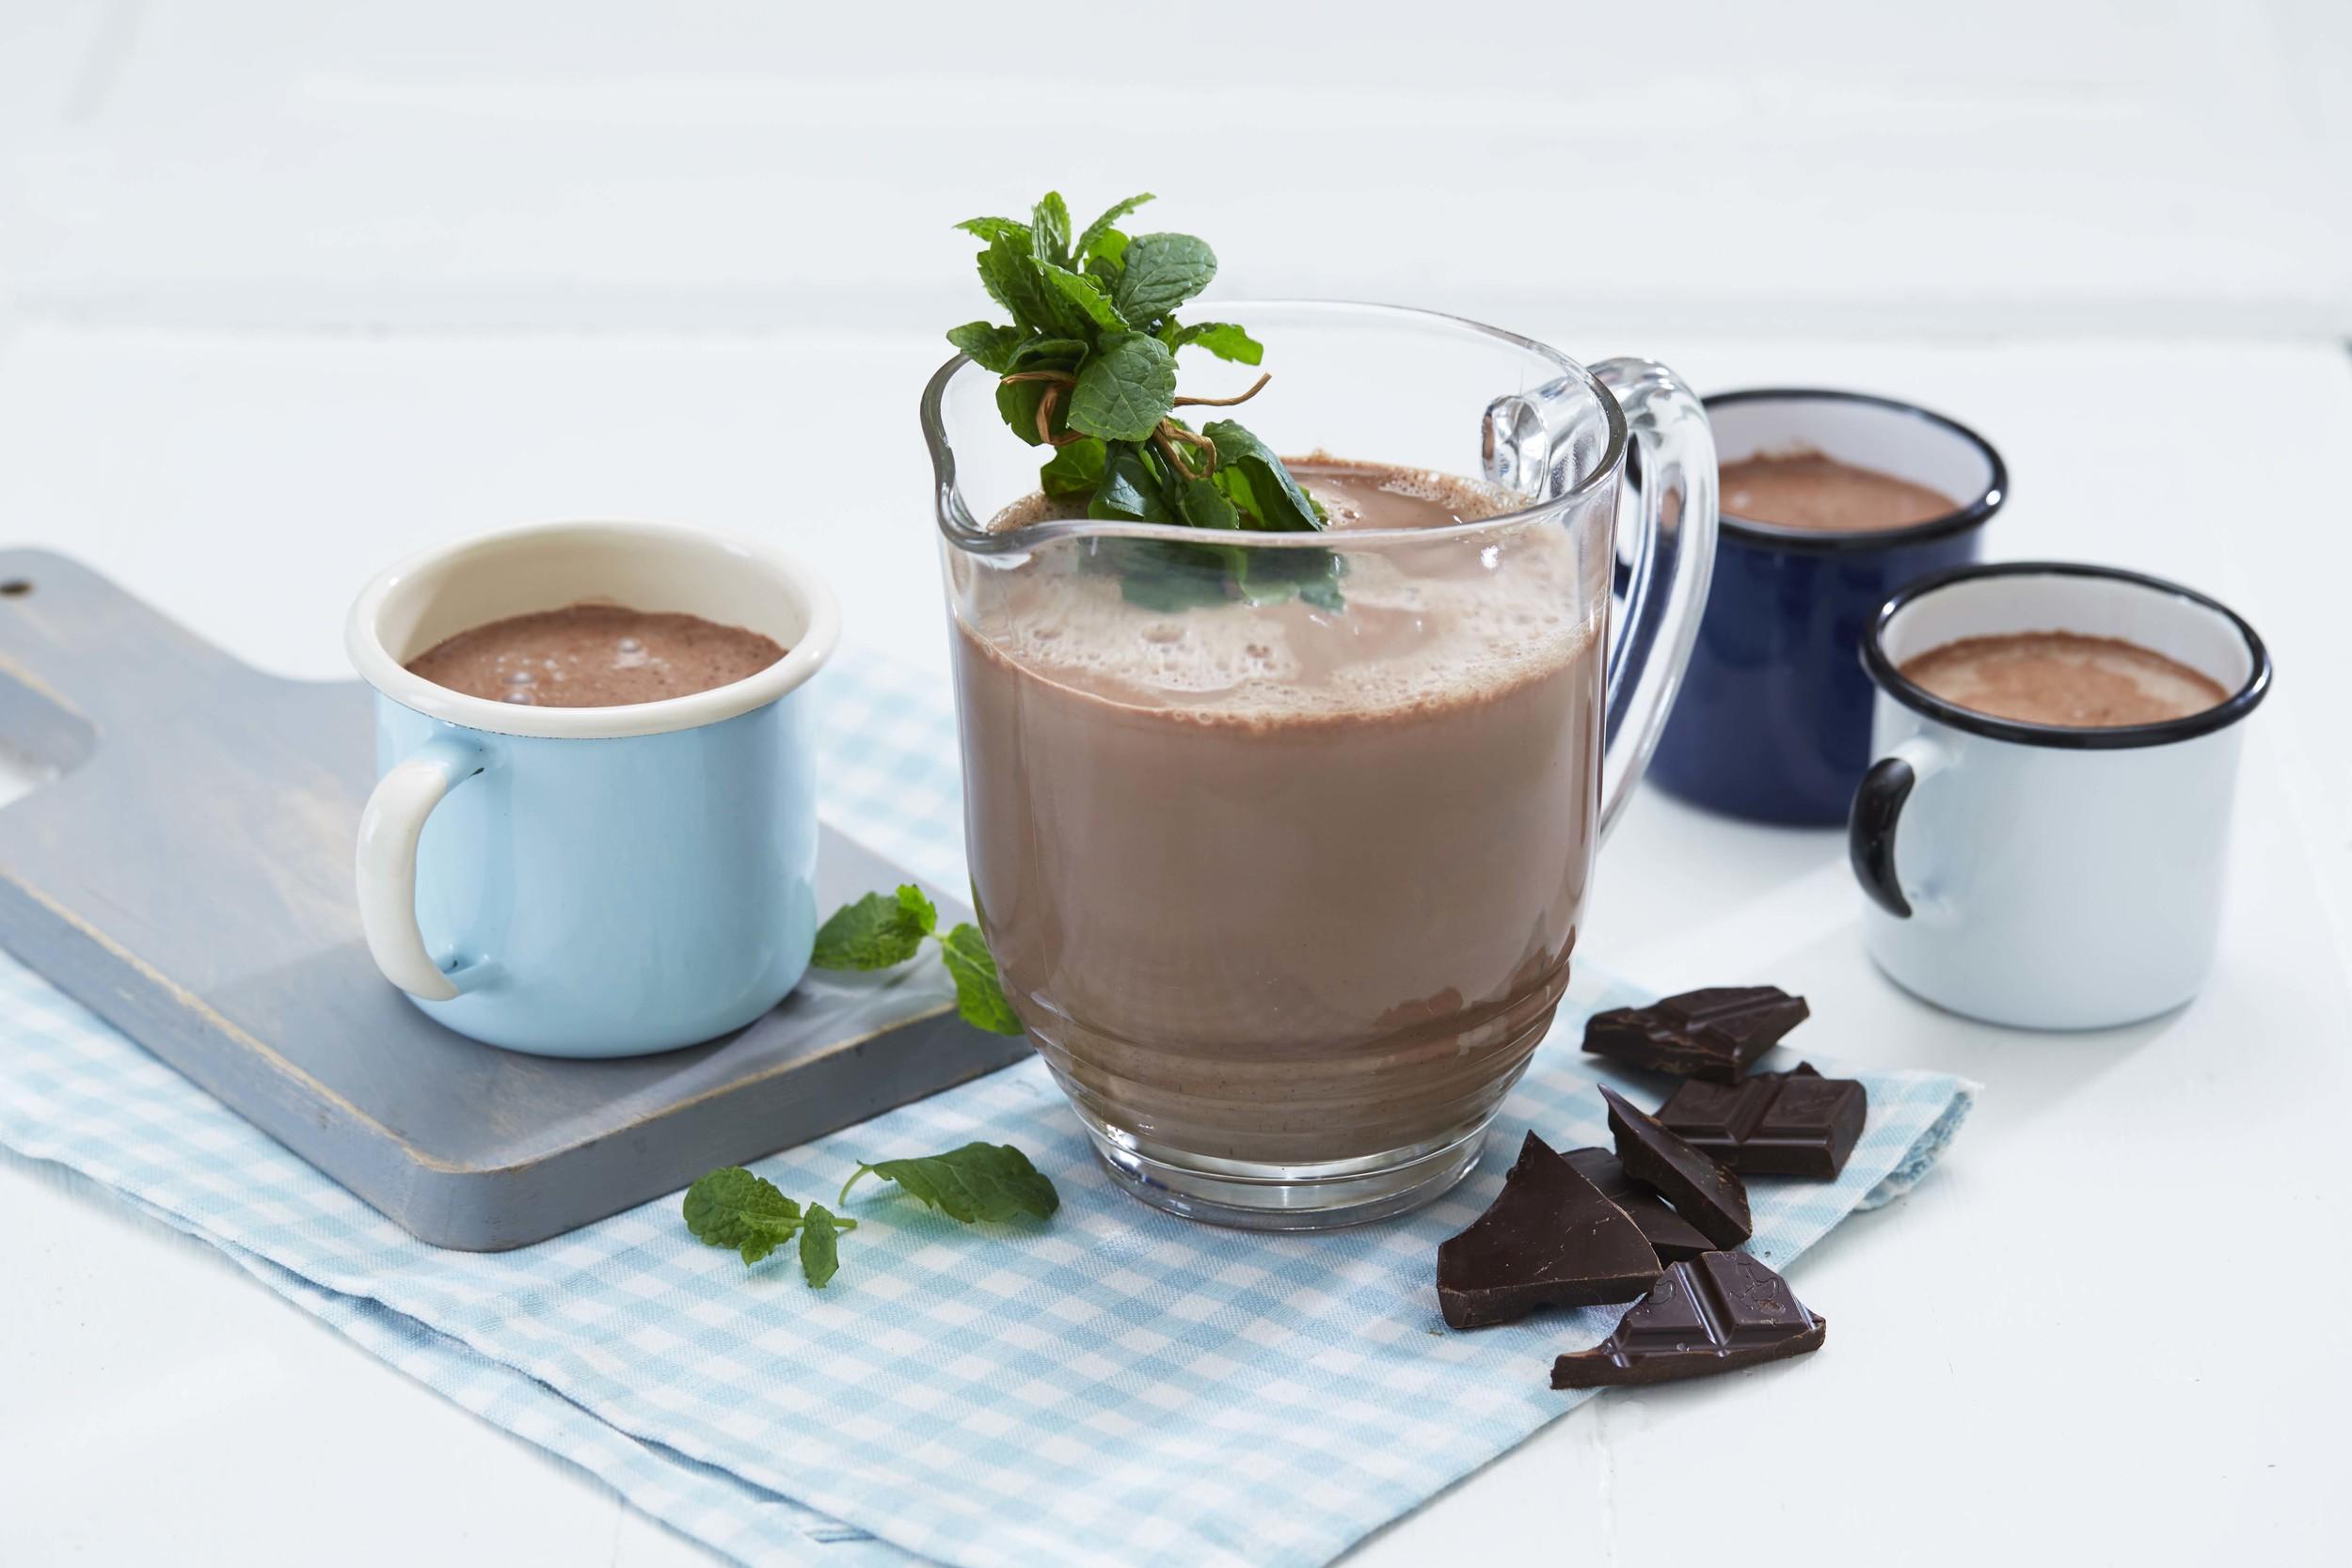 TINE_Varme drikker_Kakao m mynte.jpg